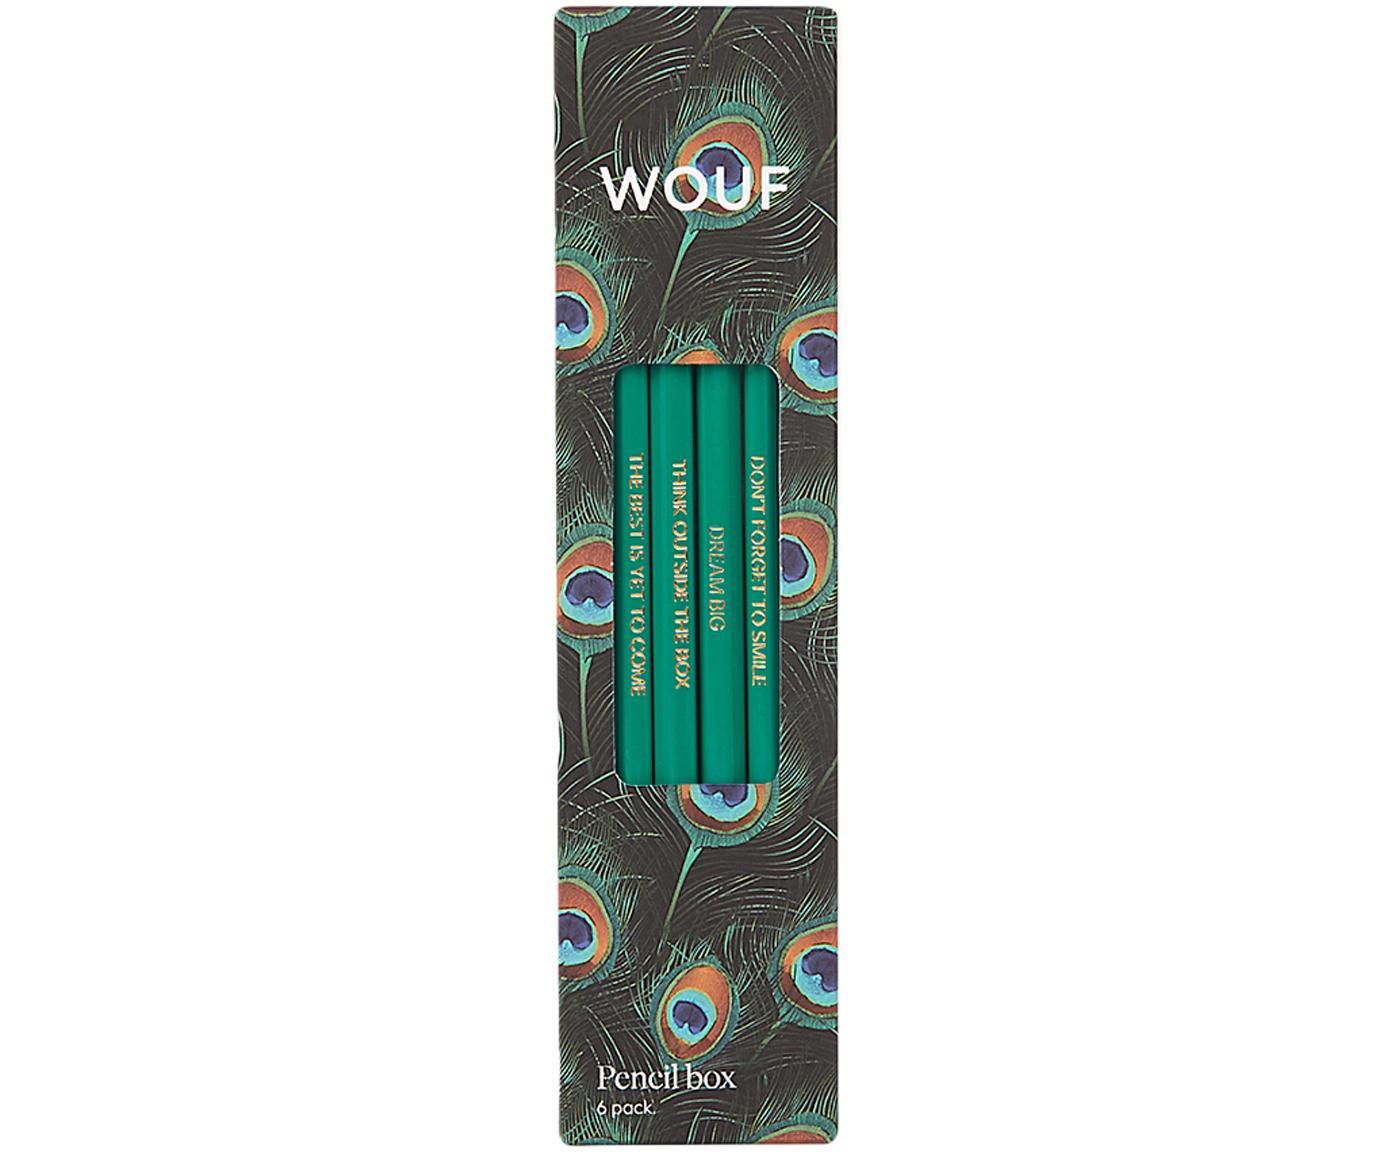 Set matite Peacock, 6 pz., Legno, Multicolore, Larg. 18 x Alt. 5 cm